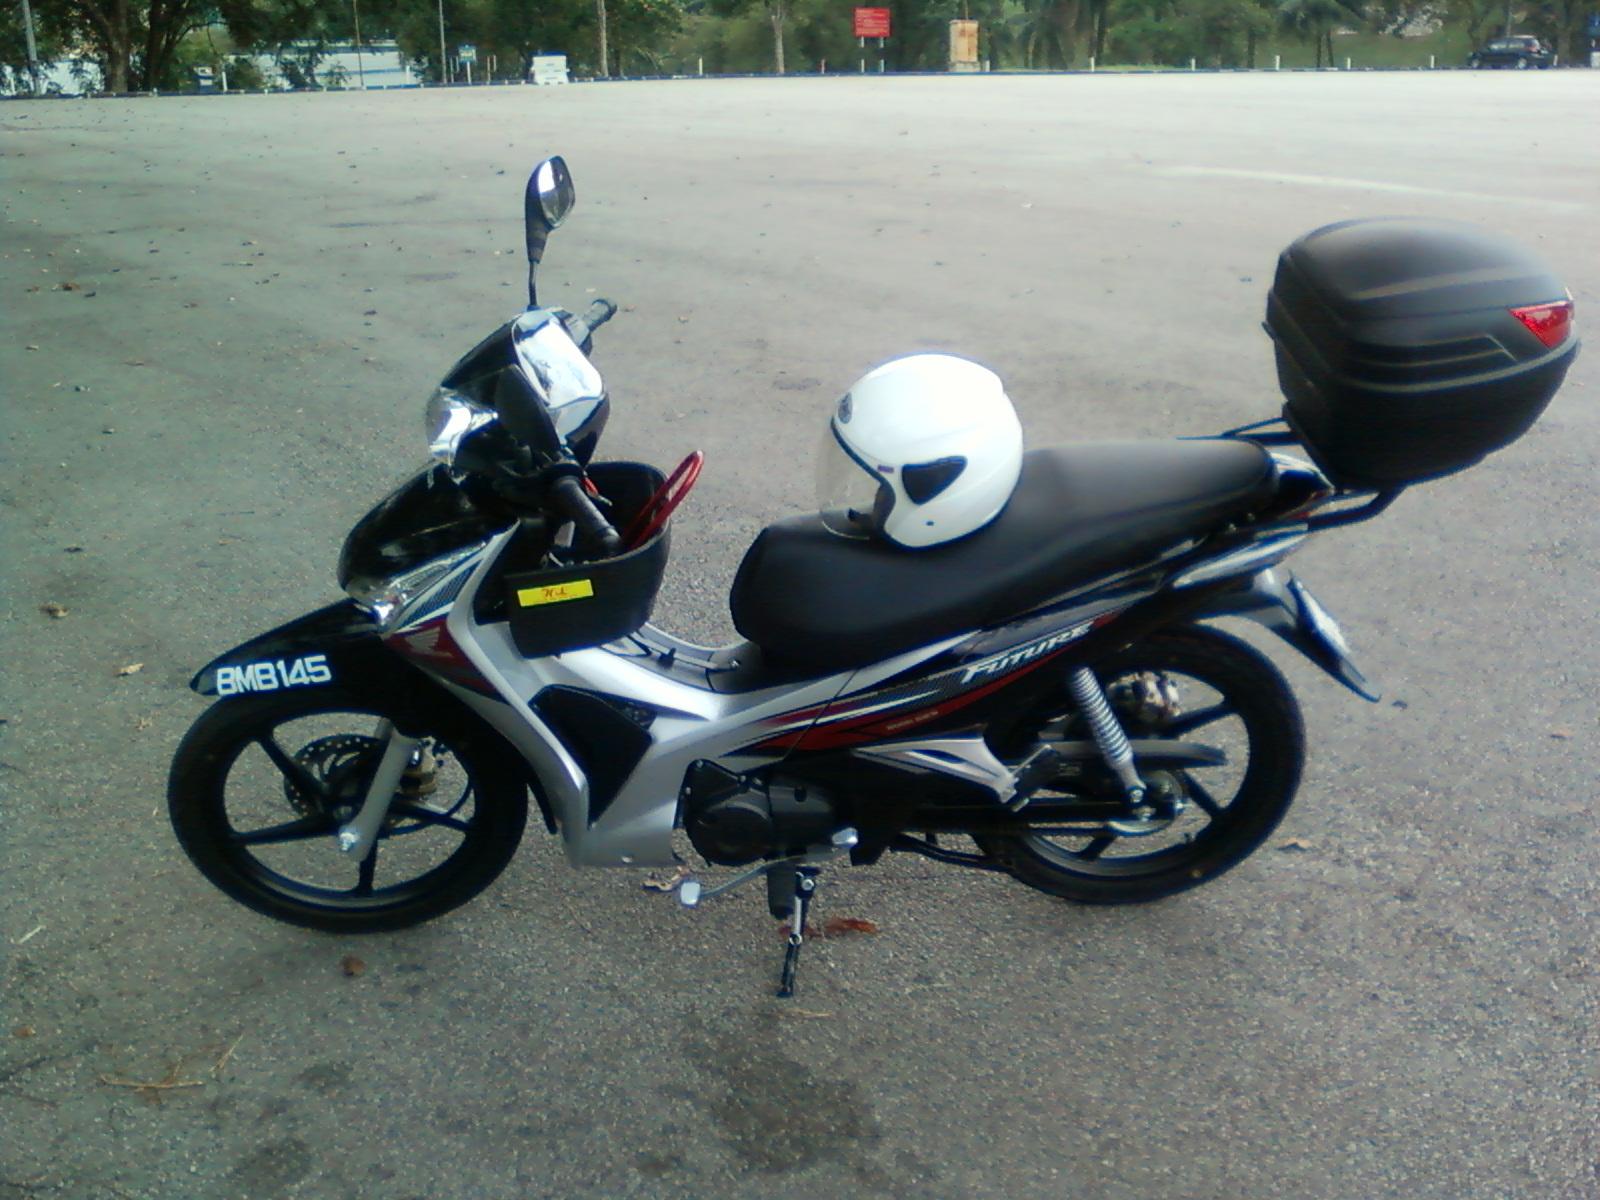 Honda Wave 125 Price >> Paradigm ~ Unyielding mind towards archievement: Honda Future 125cc - Crescent ride for my ...